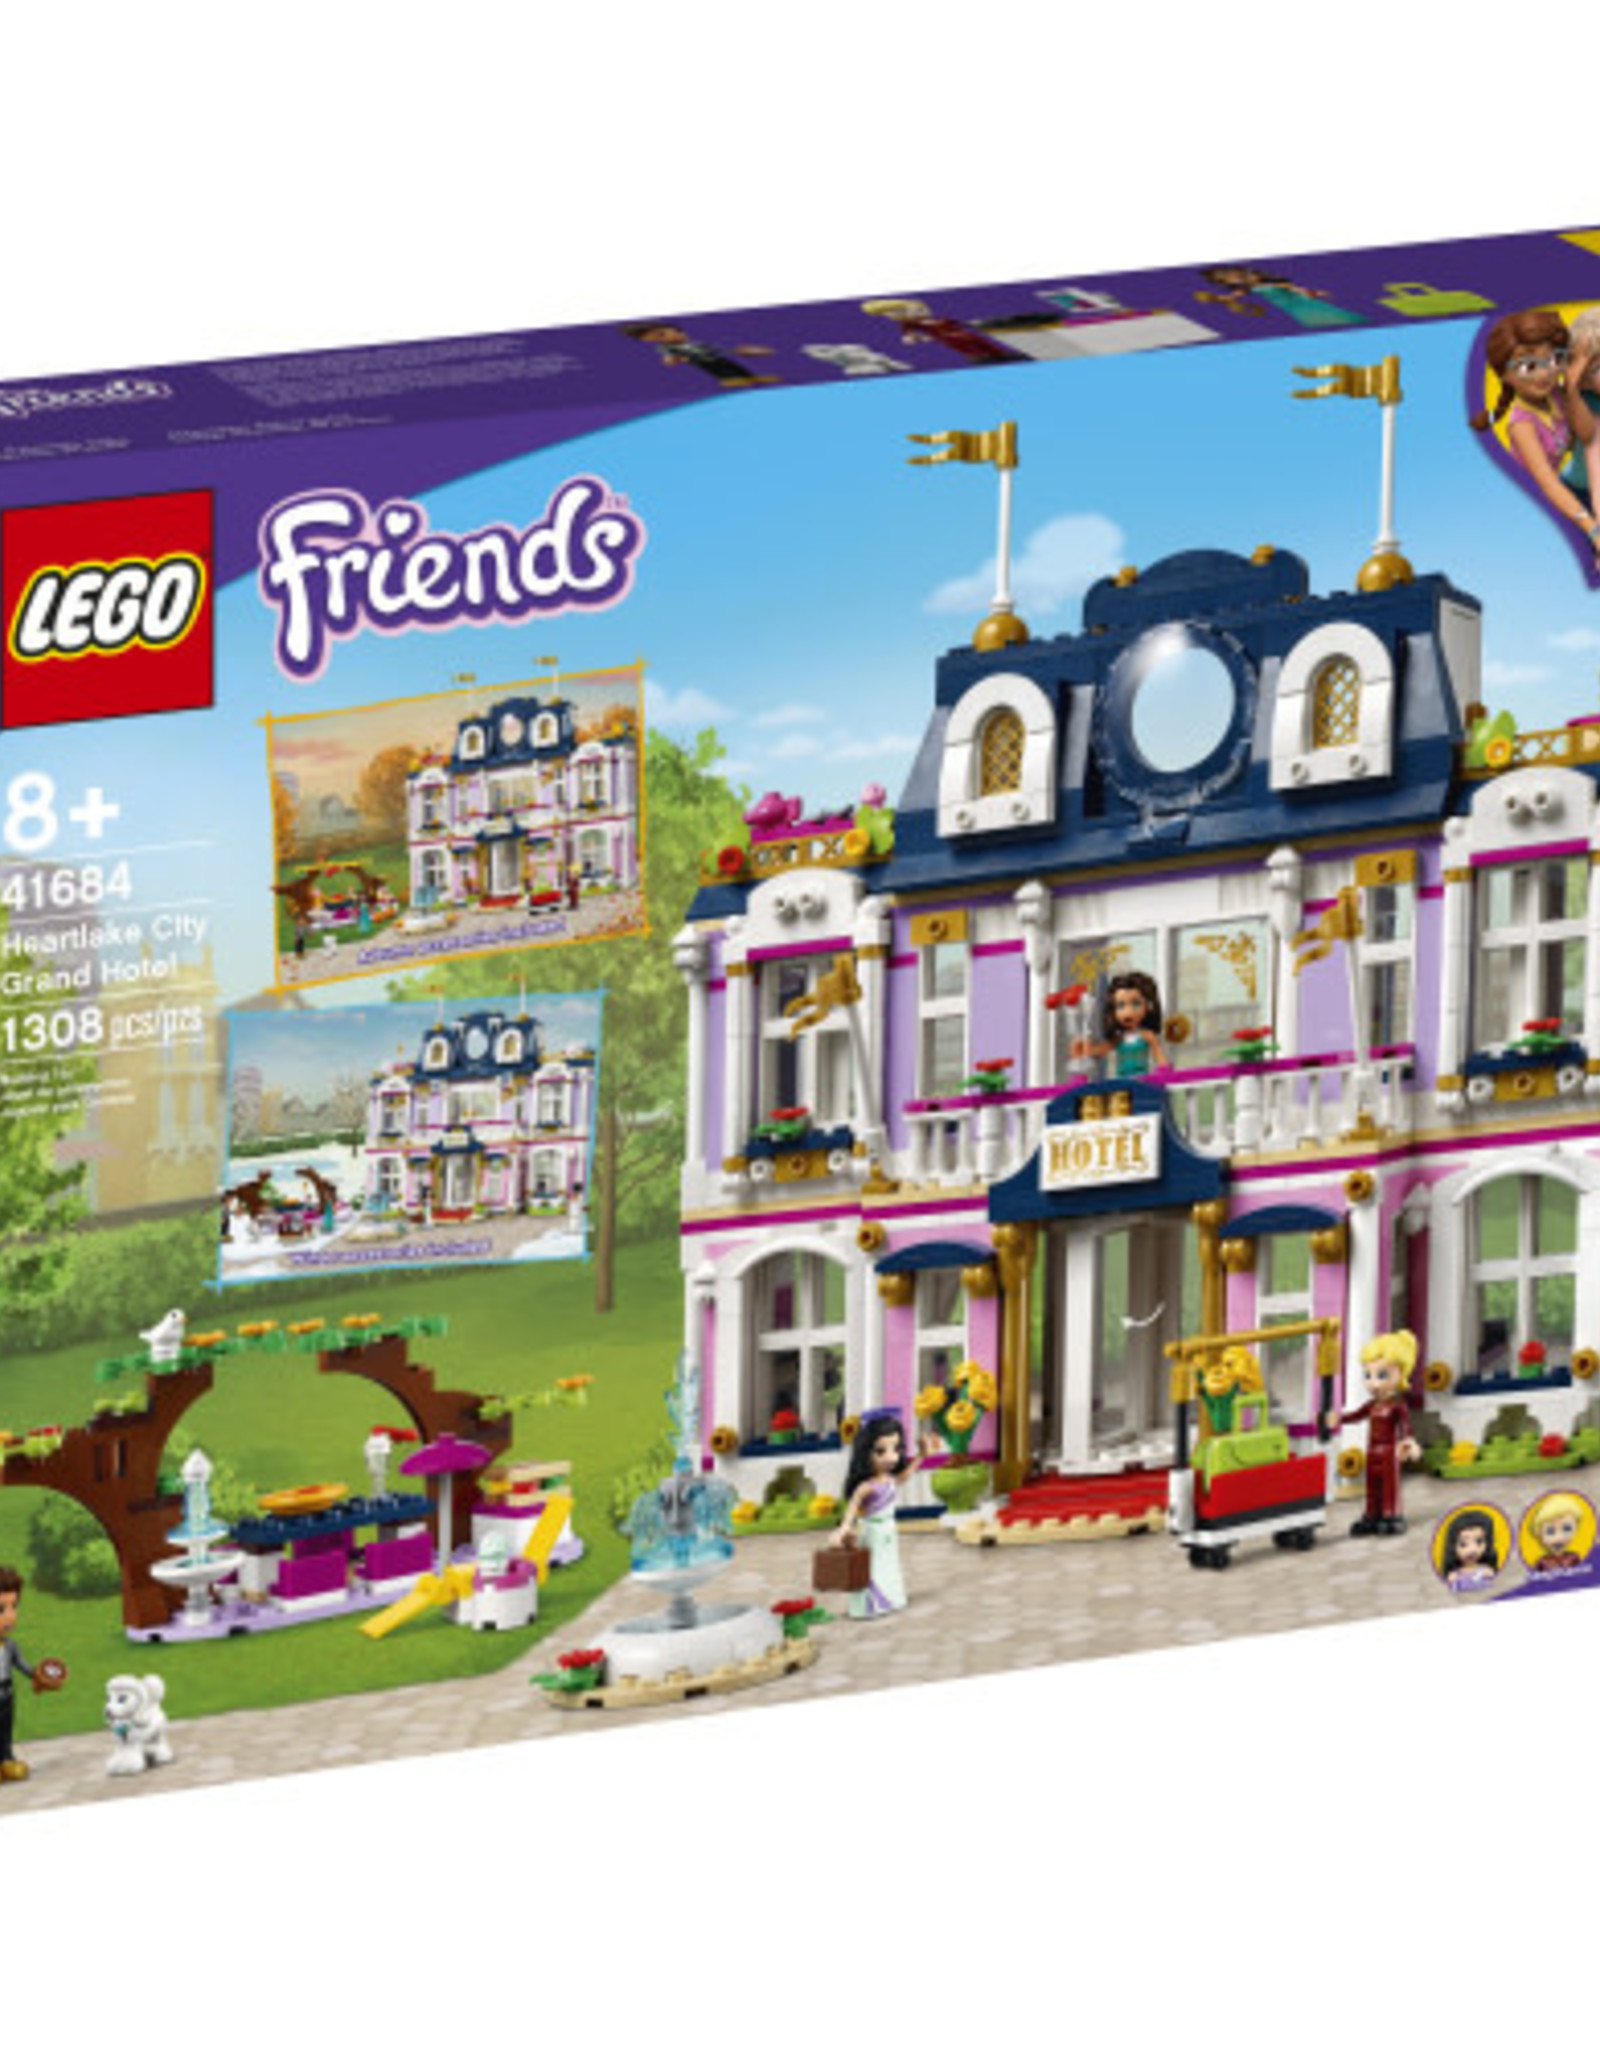 LEGO 41684 Heartlake City Grand Hotel V39